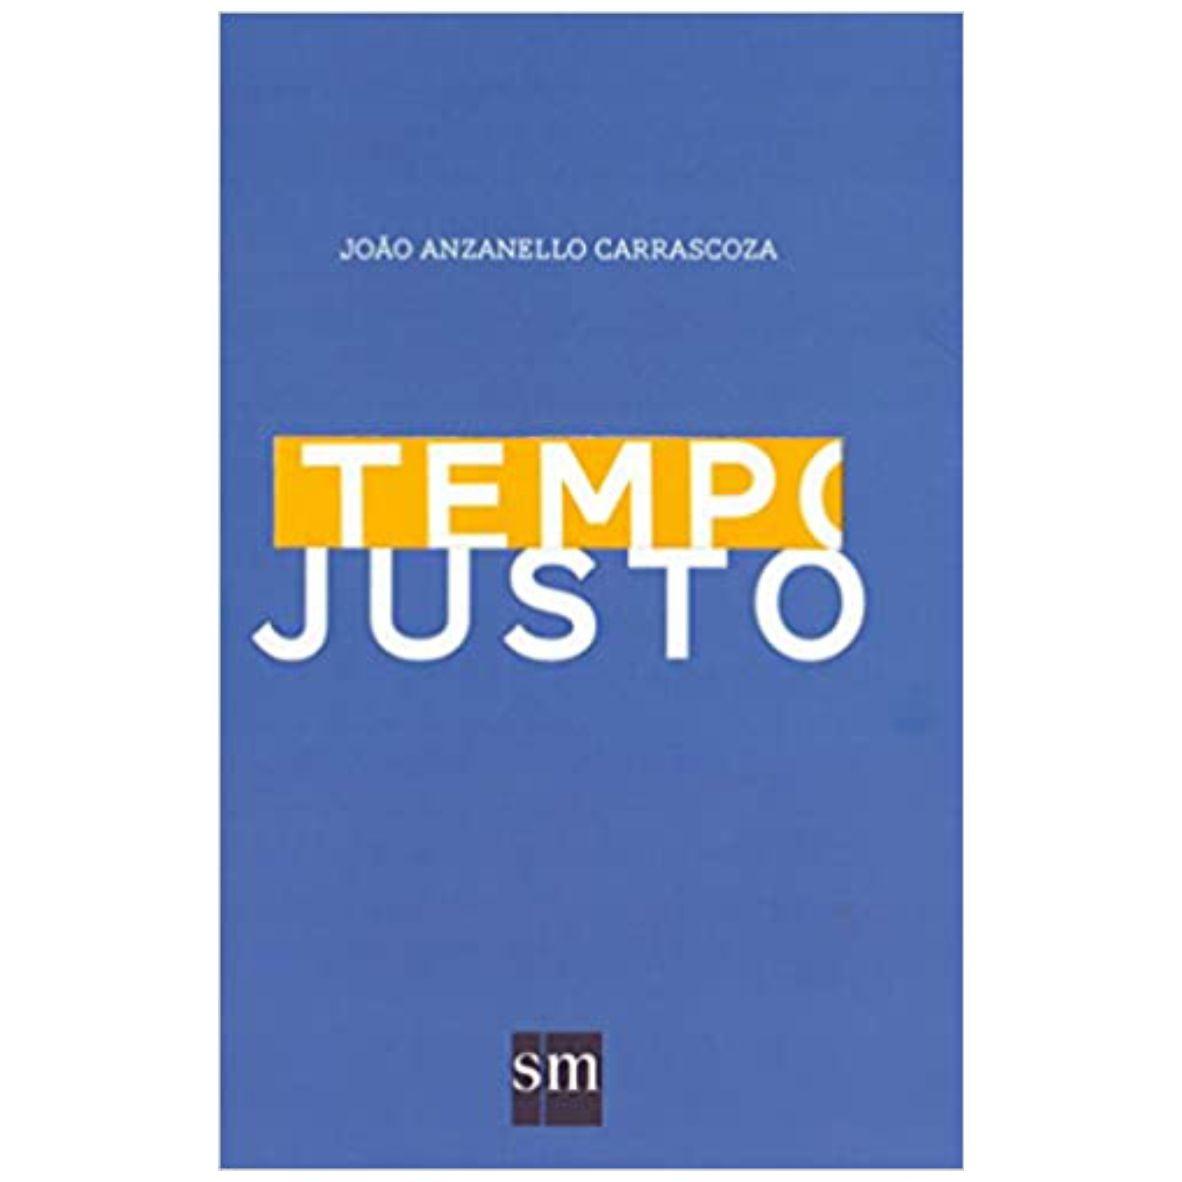 Livro Tempo Justo - Editora SM